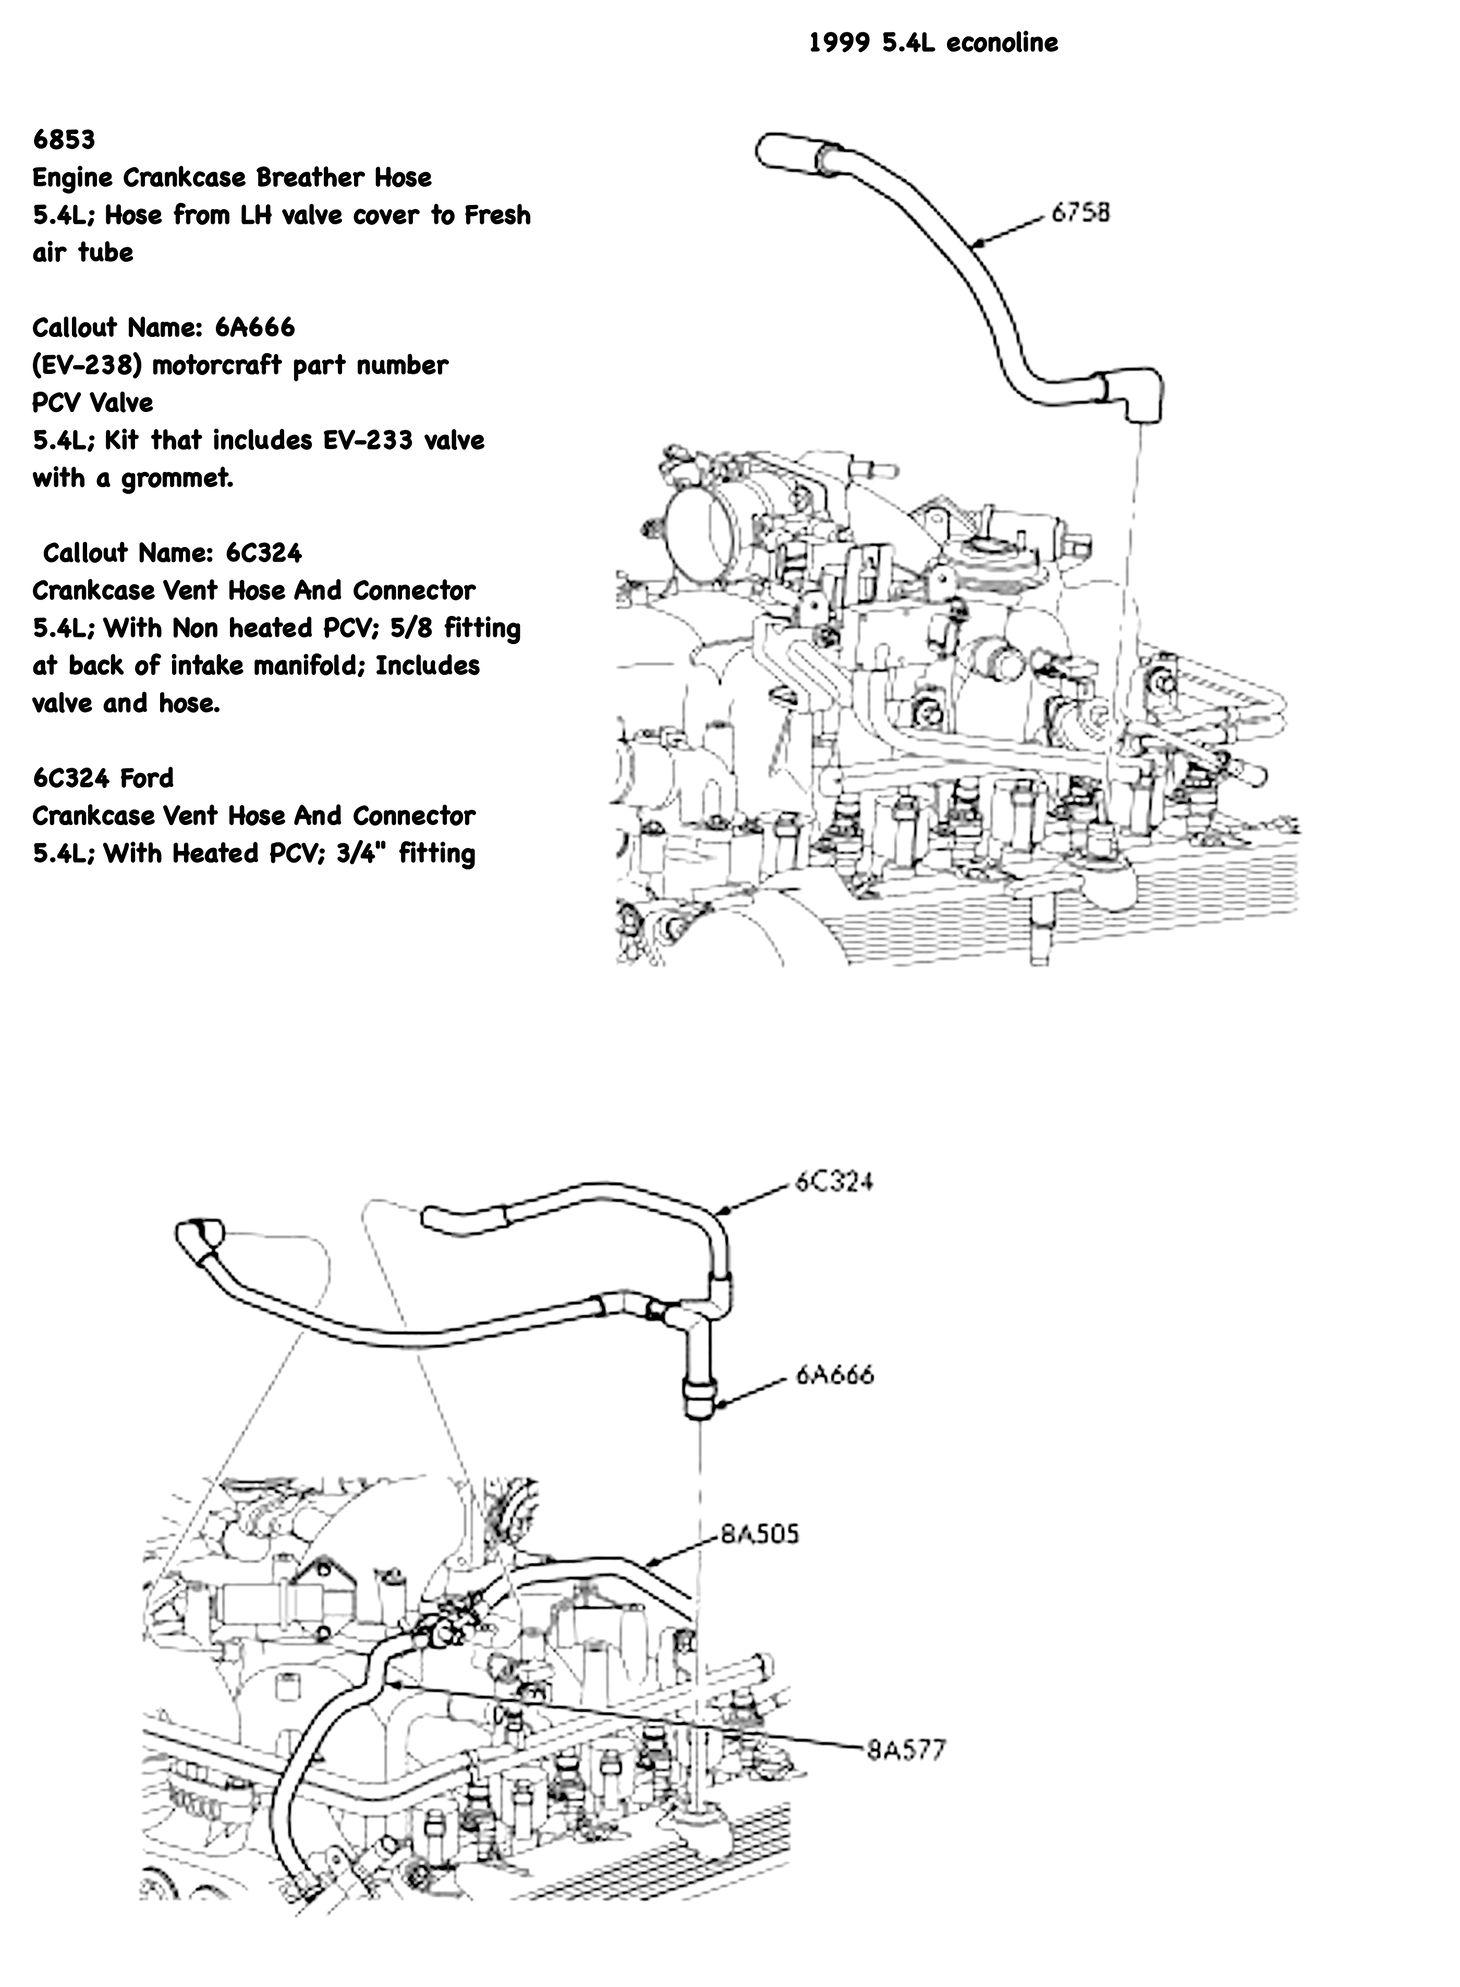 1995 toyota avalon engine diagram pcv